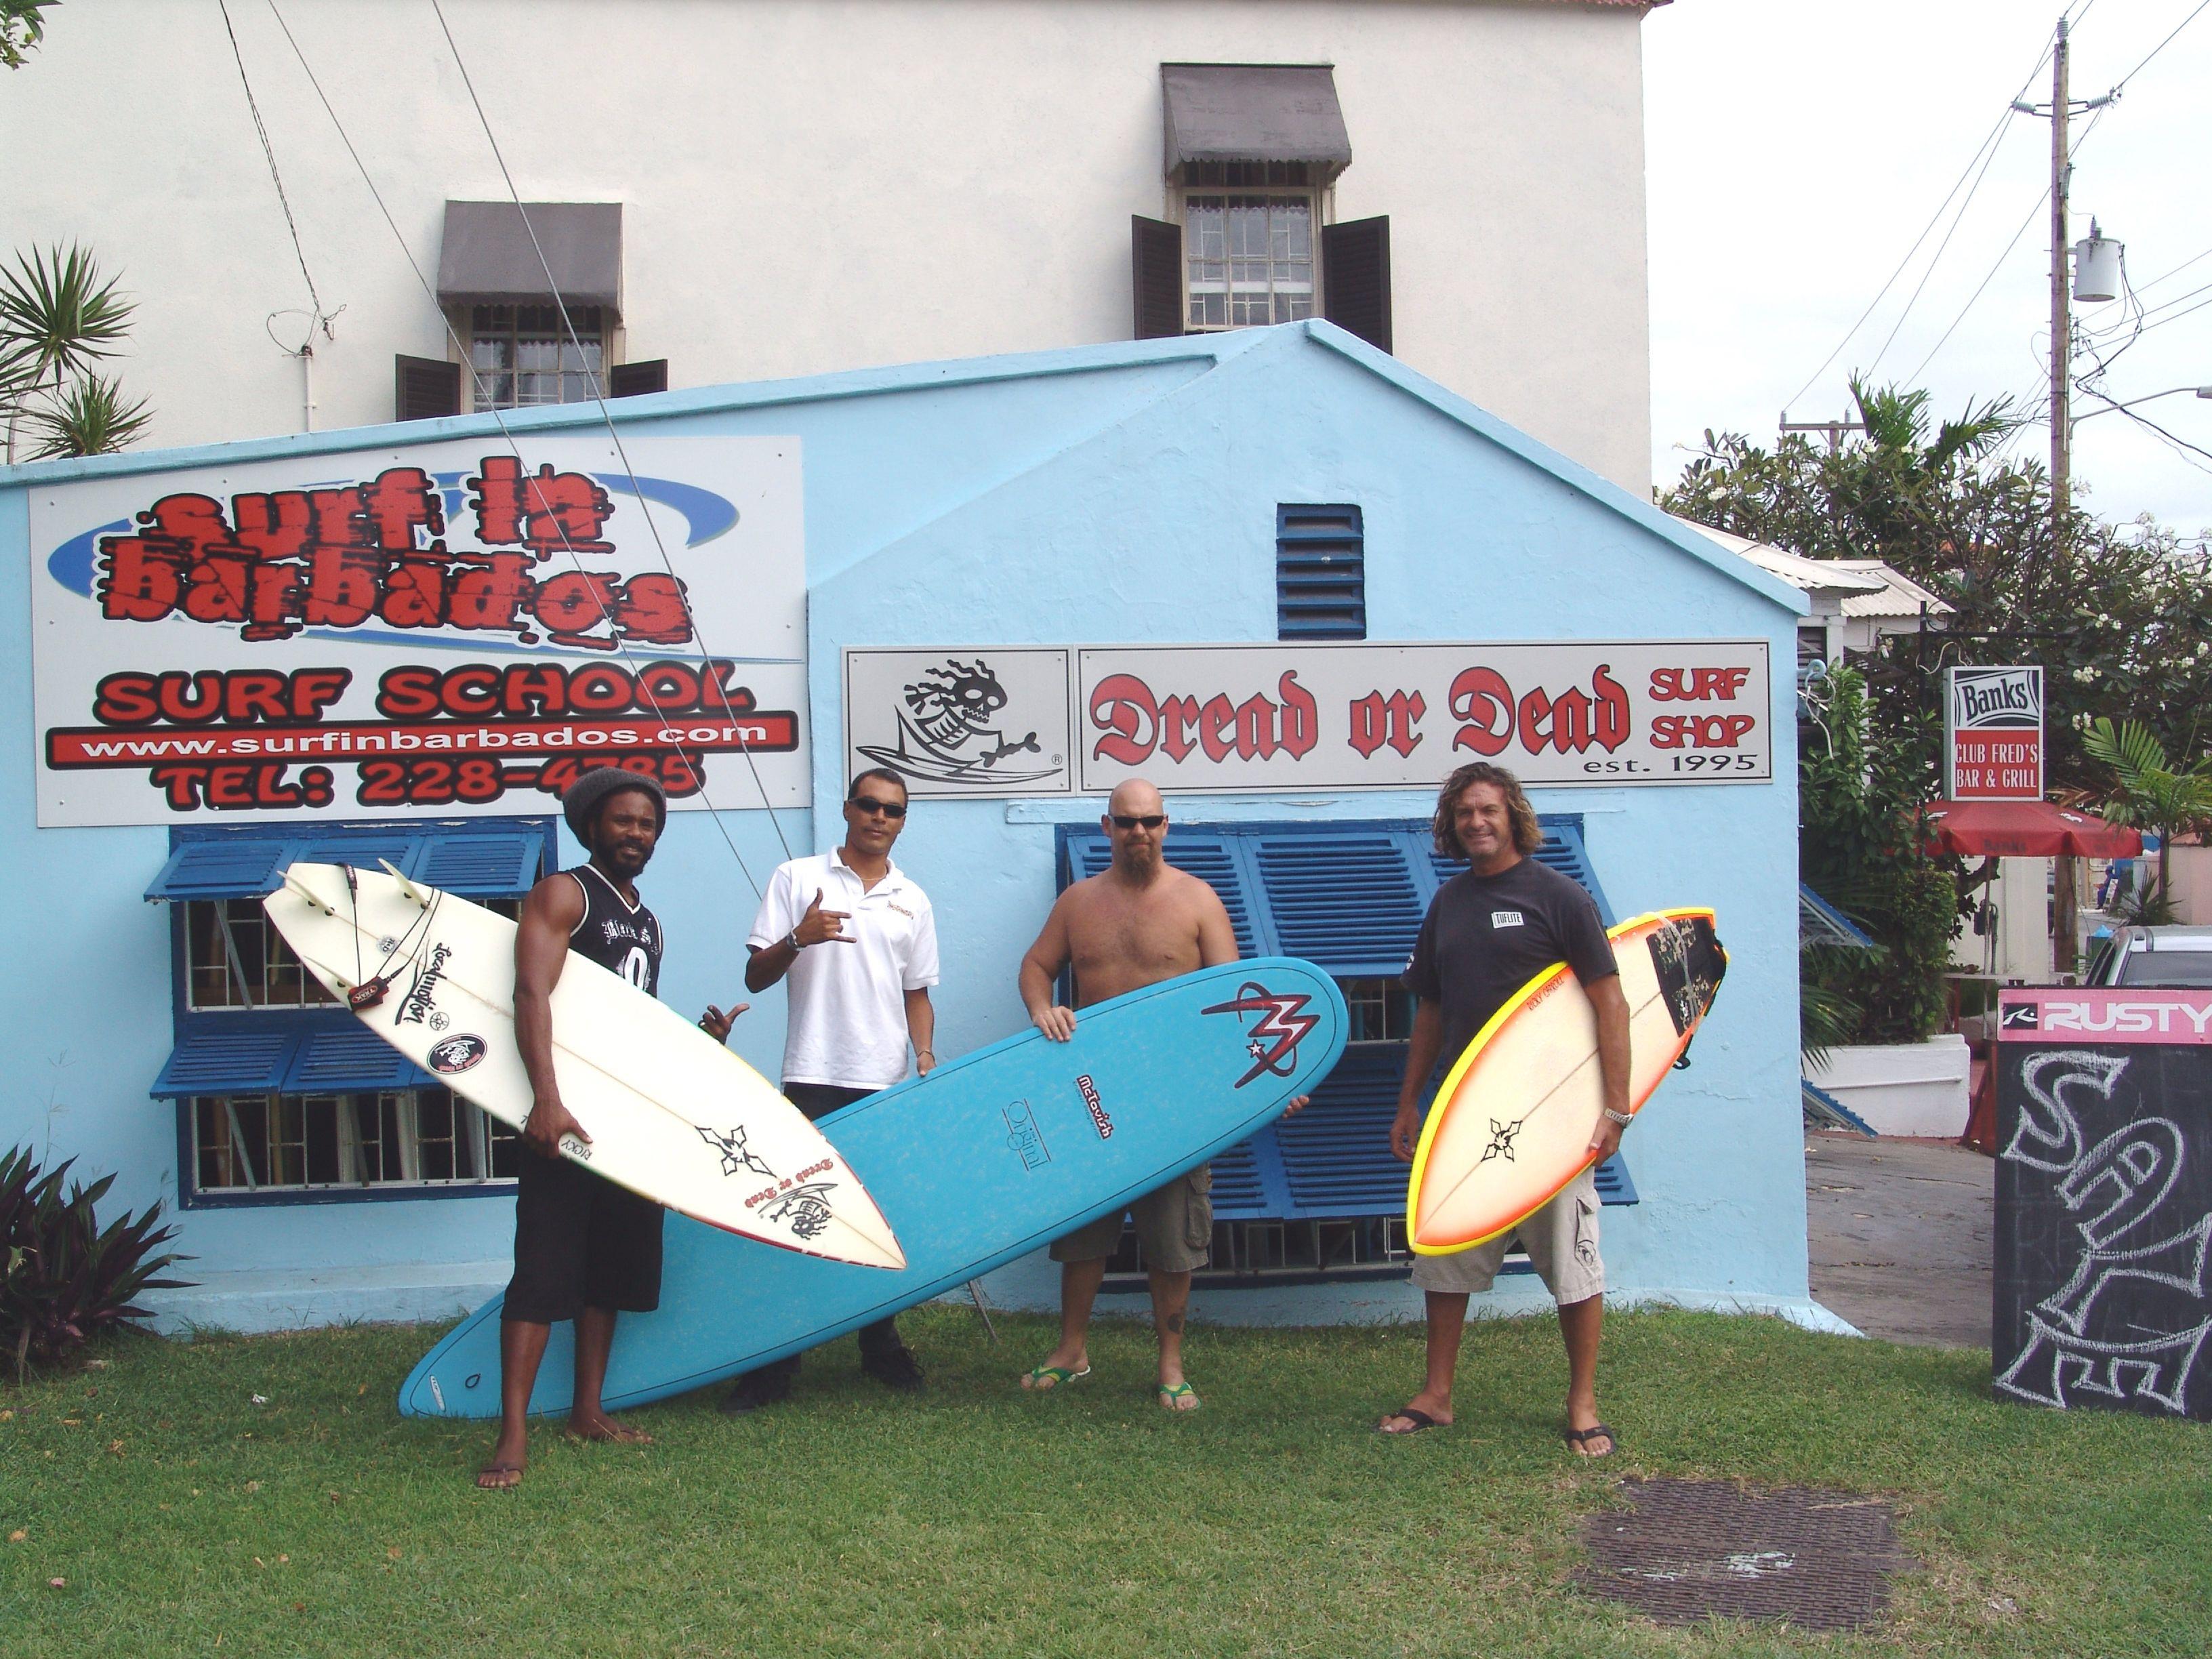 Dread Or Dead Surf Shop Surfinbarbados Surfing Surf Shop Surf Trip